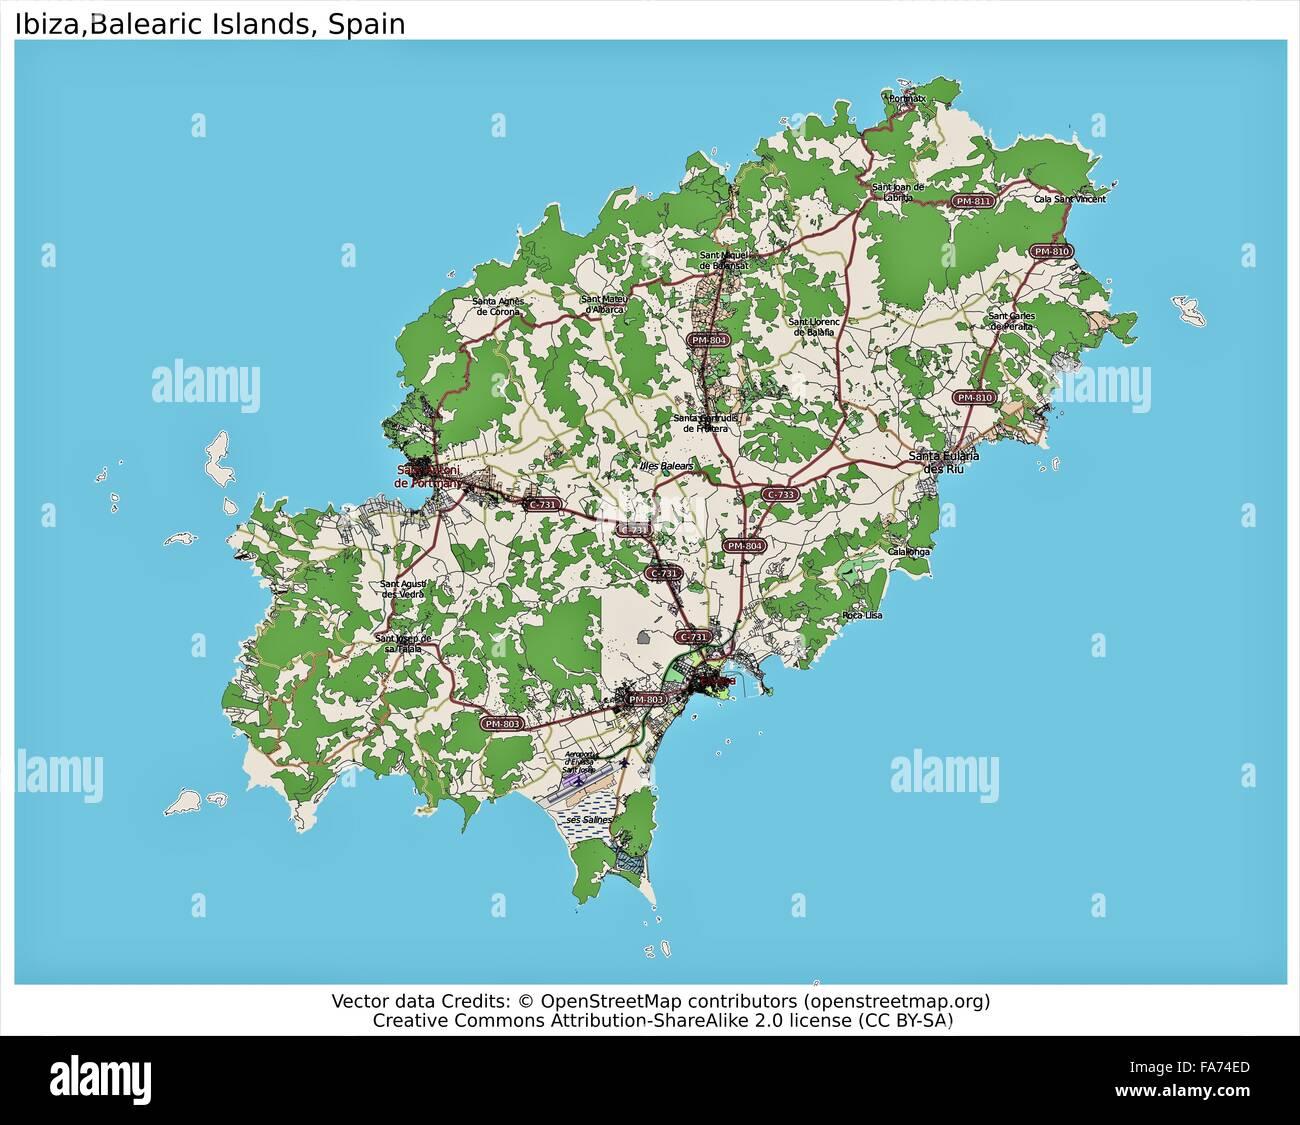 Ibiza Balearic Spain location map Stock Photo 92355605 Alamy